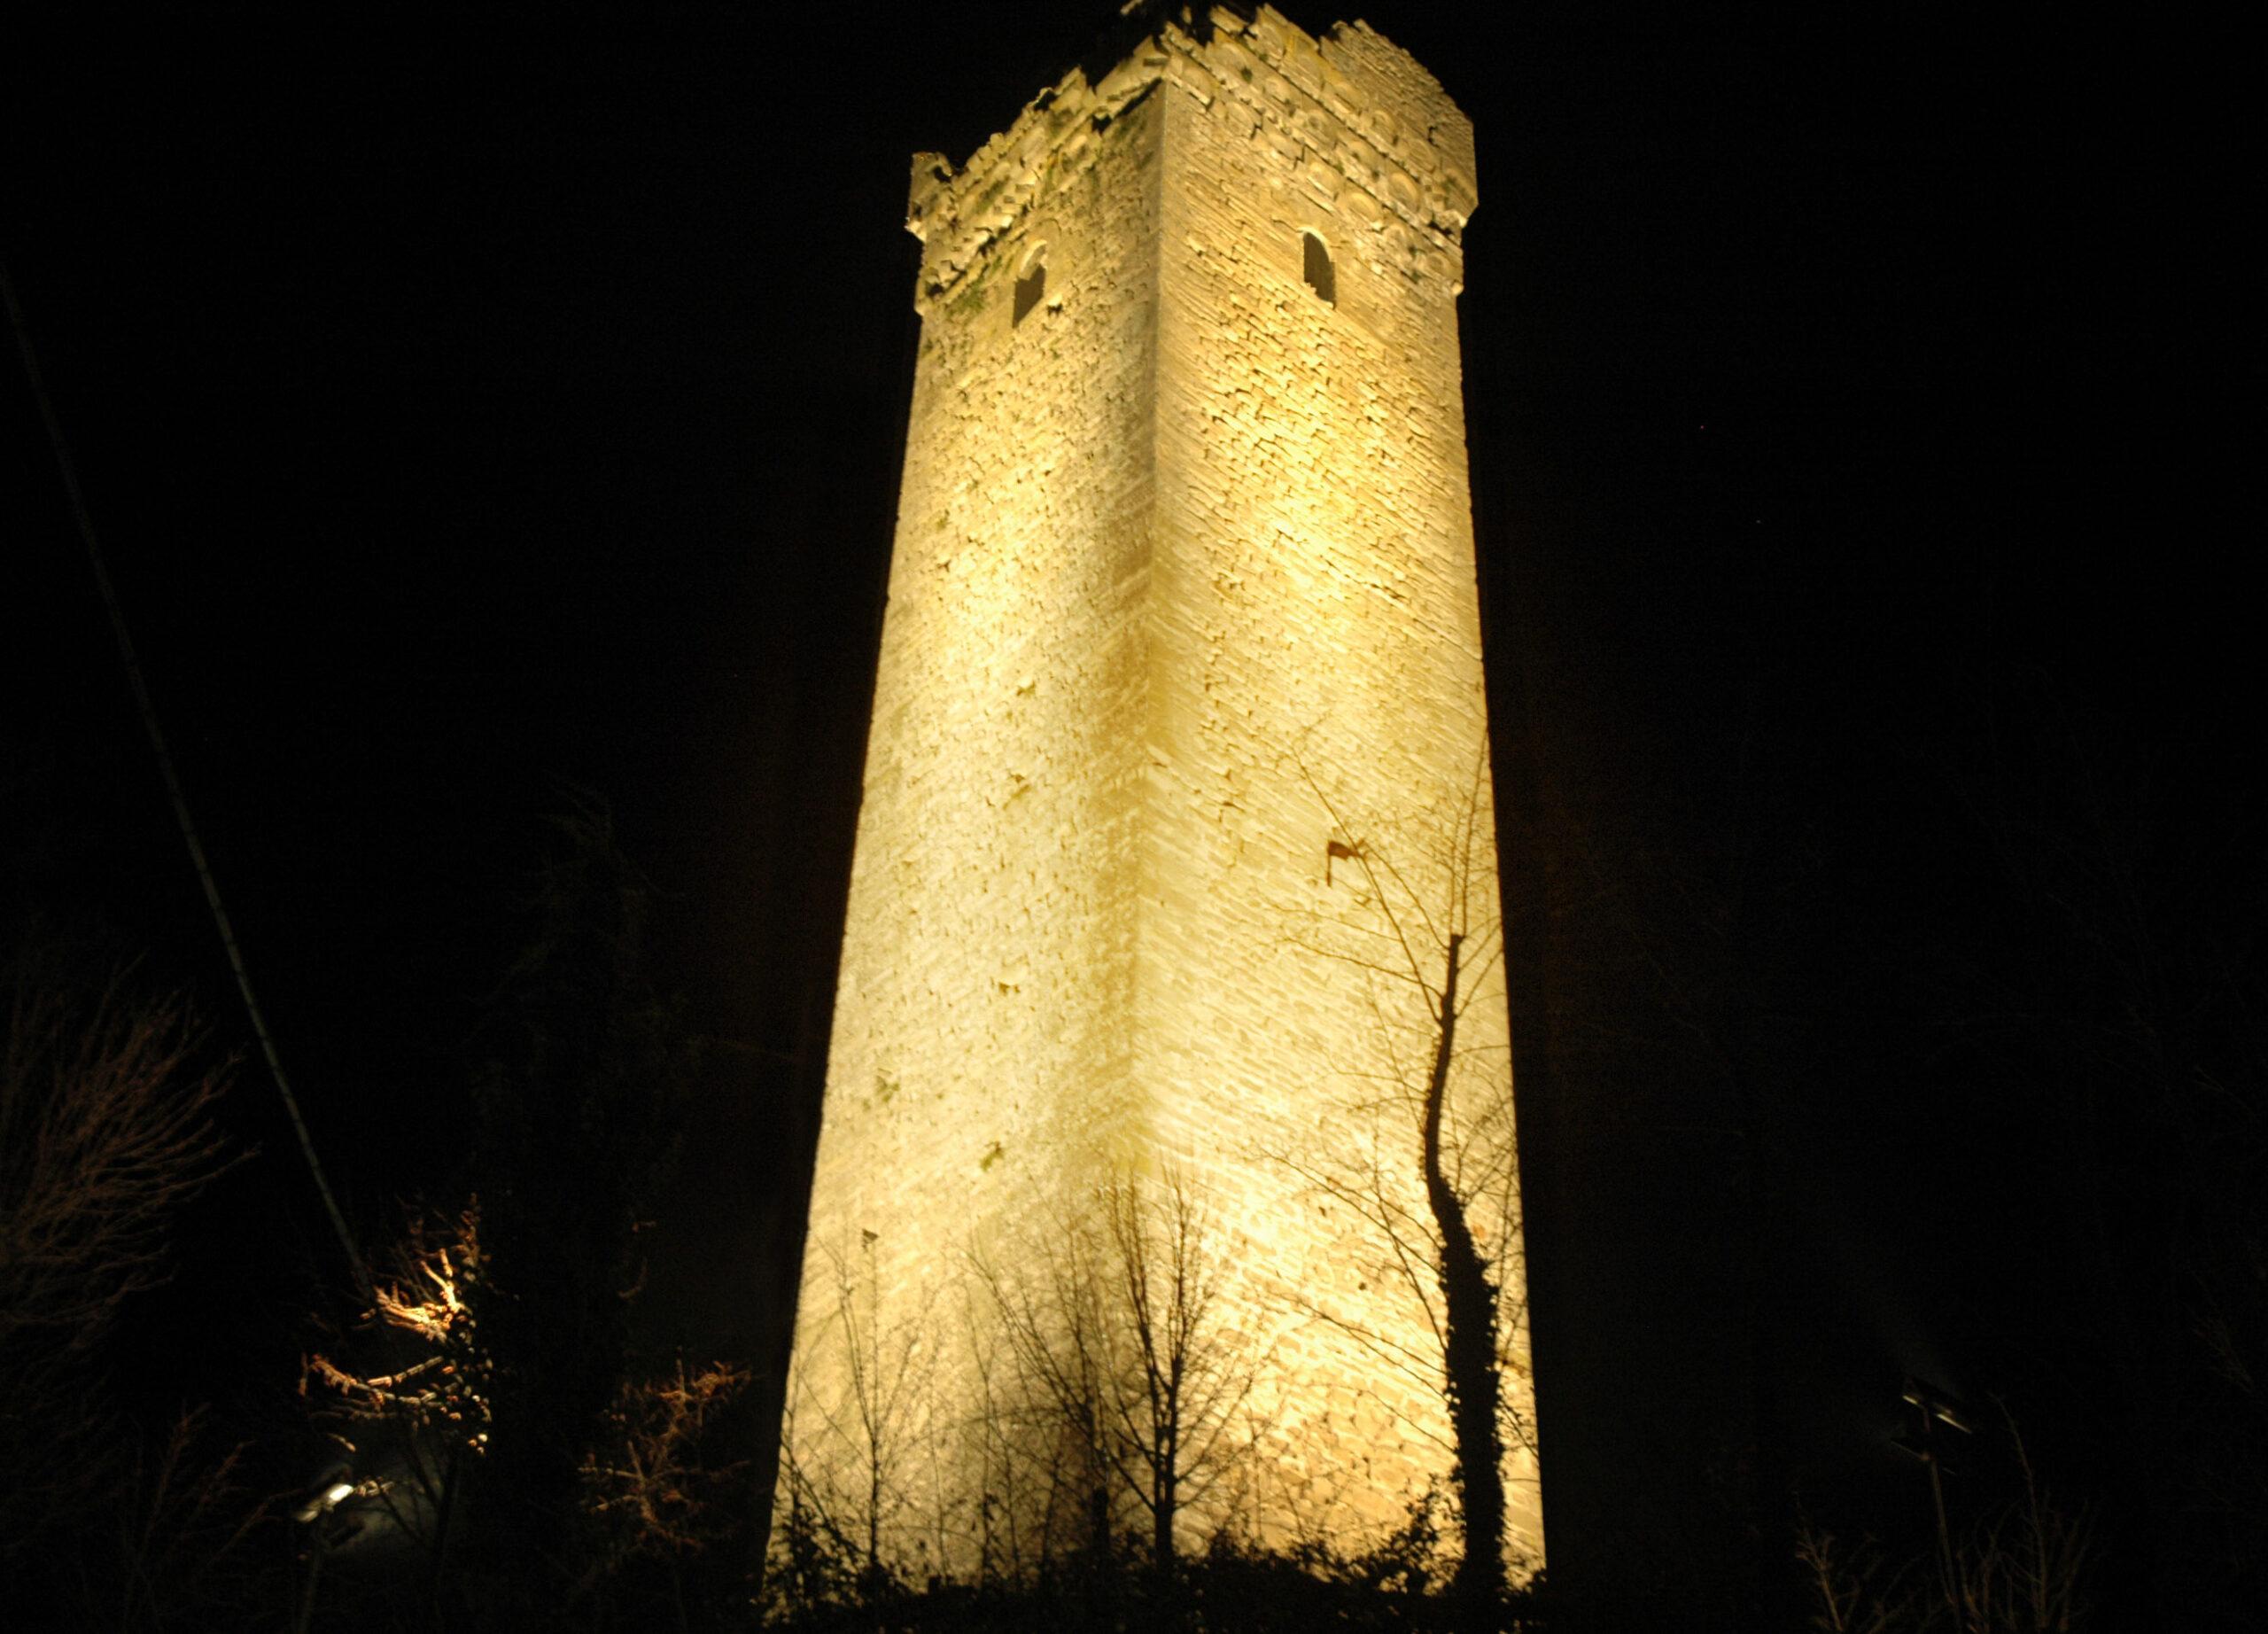 Torre di Denice - Denice Tower